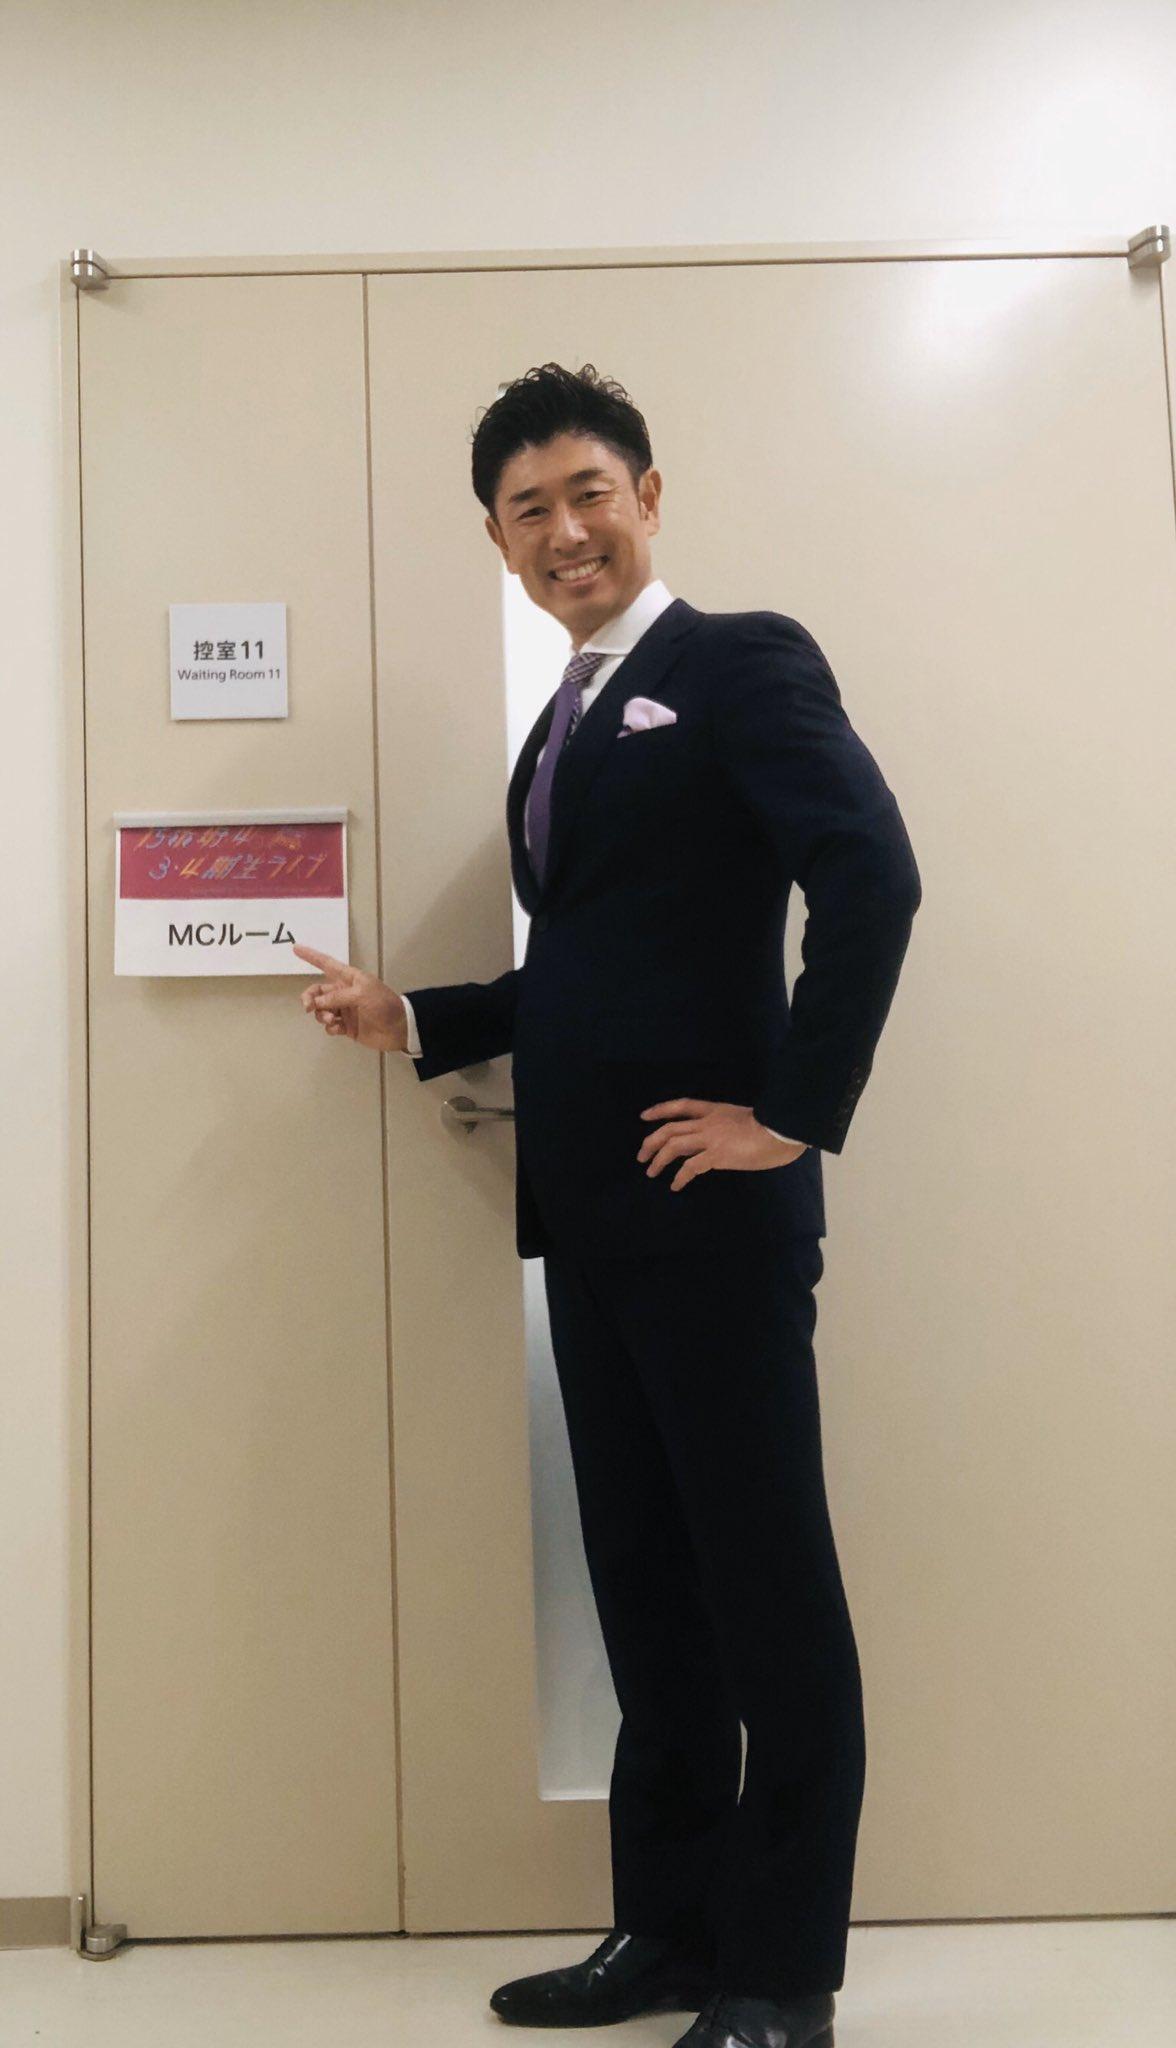 乃木坂46 3・4期生ライブ 髙橋大輔